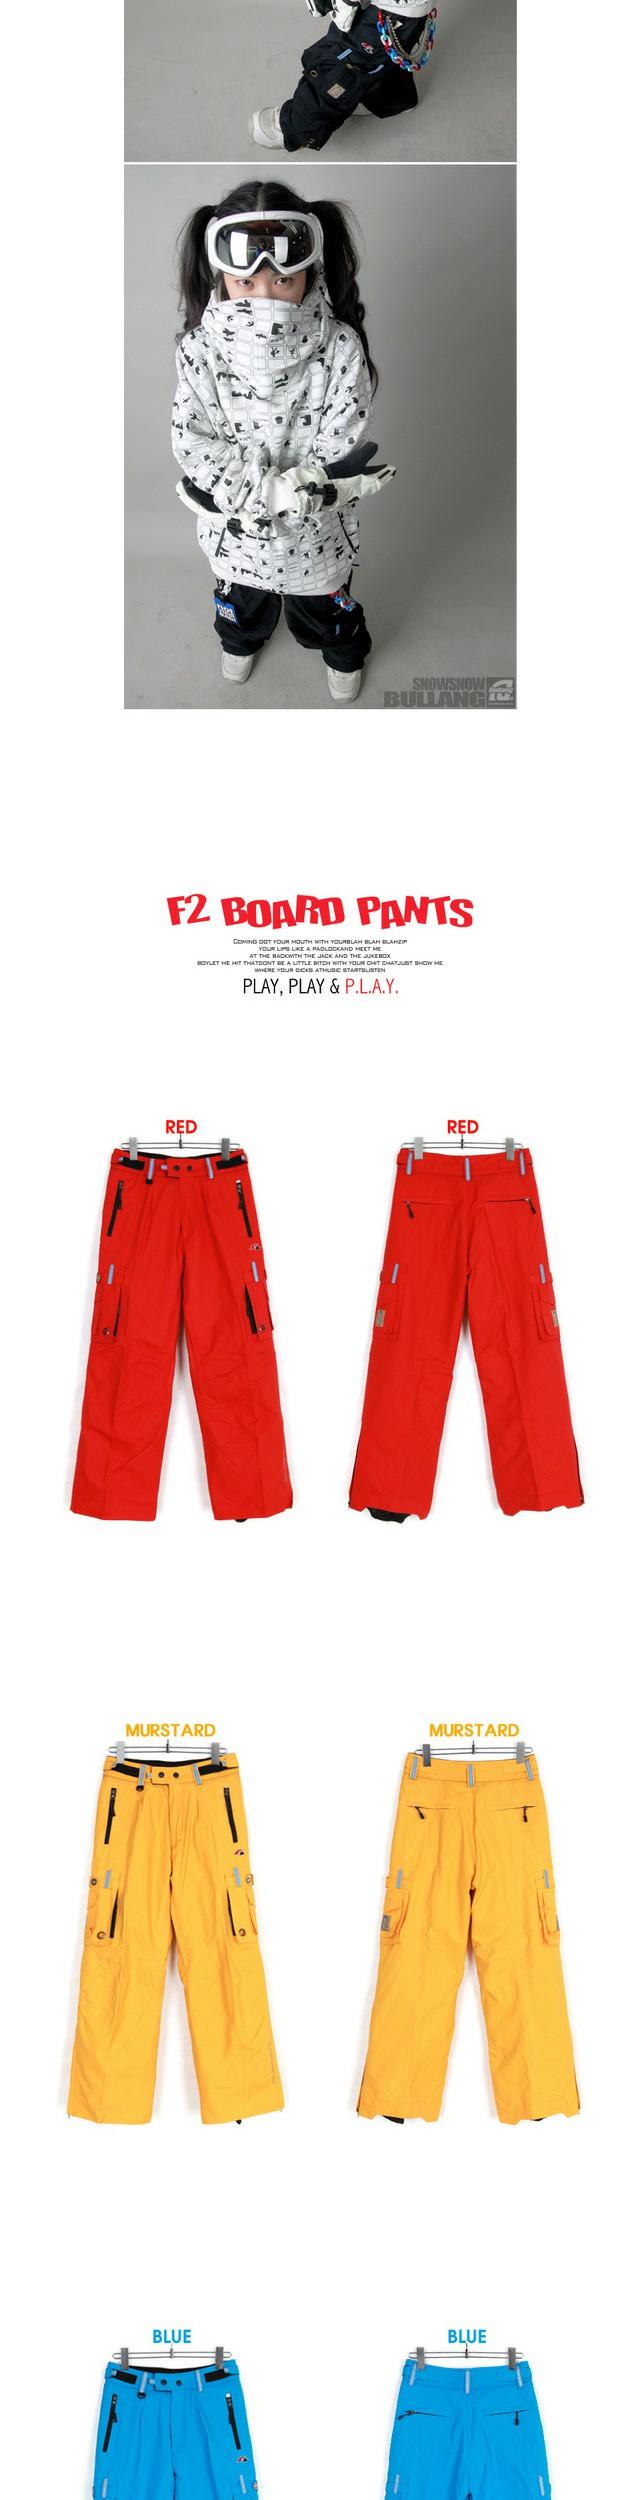 F2 Board Pants